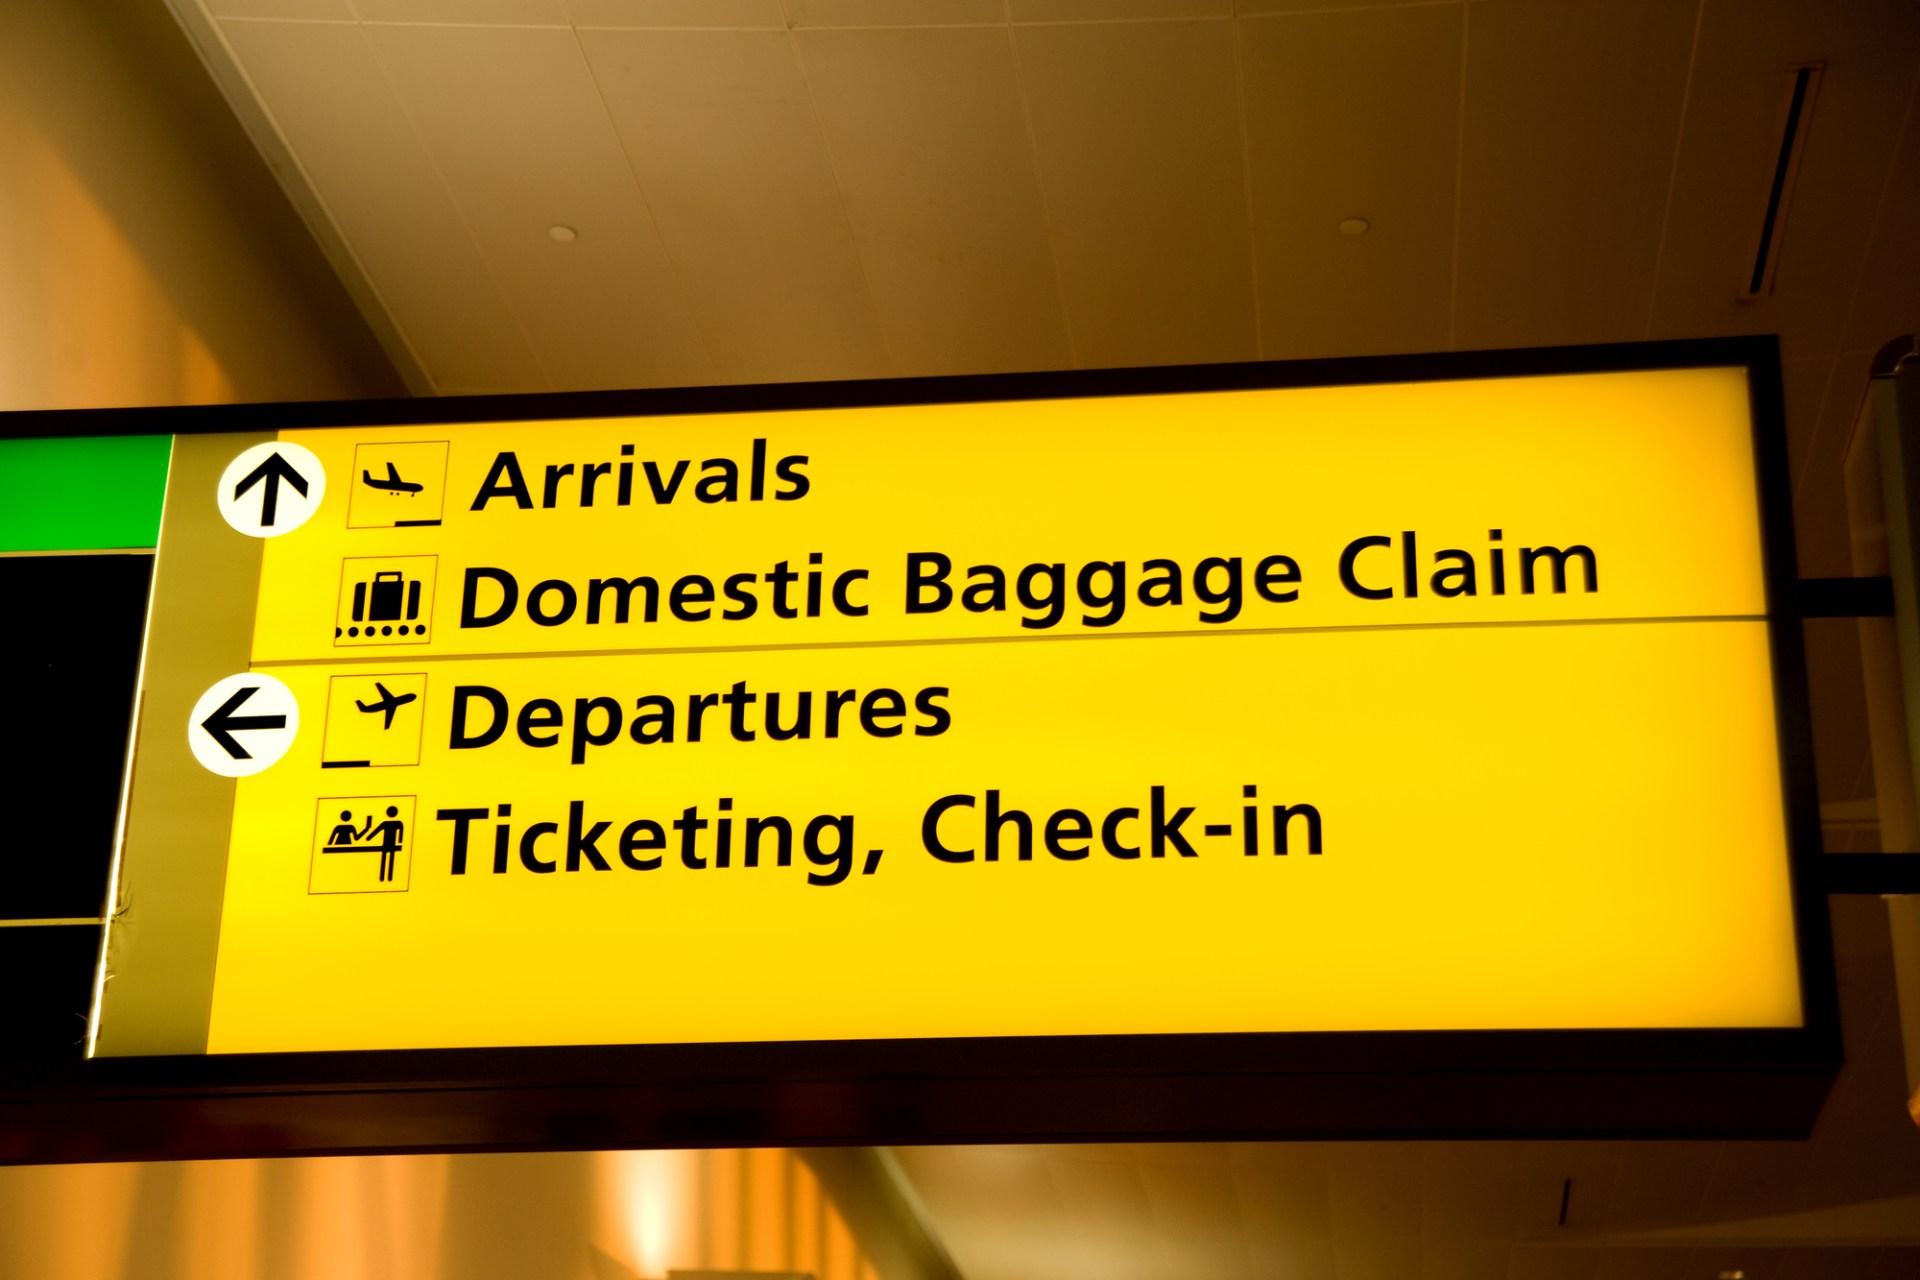 How JFK Airport Saved My Christmas